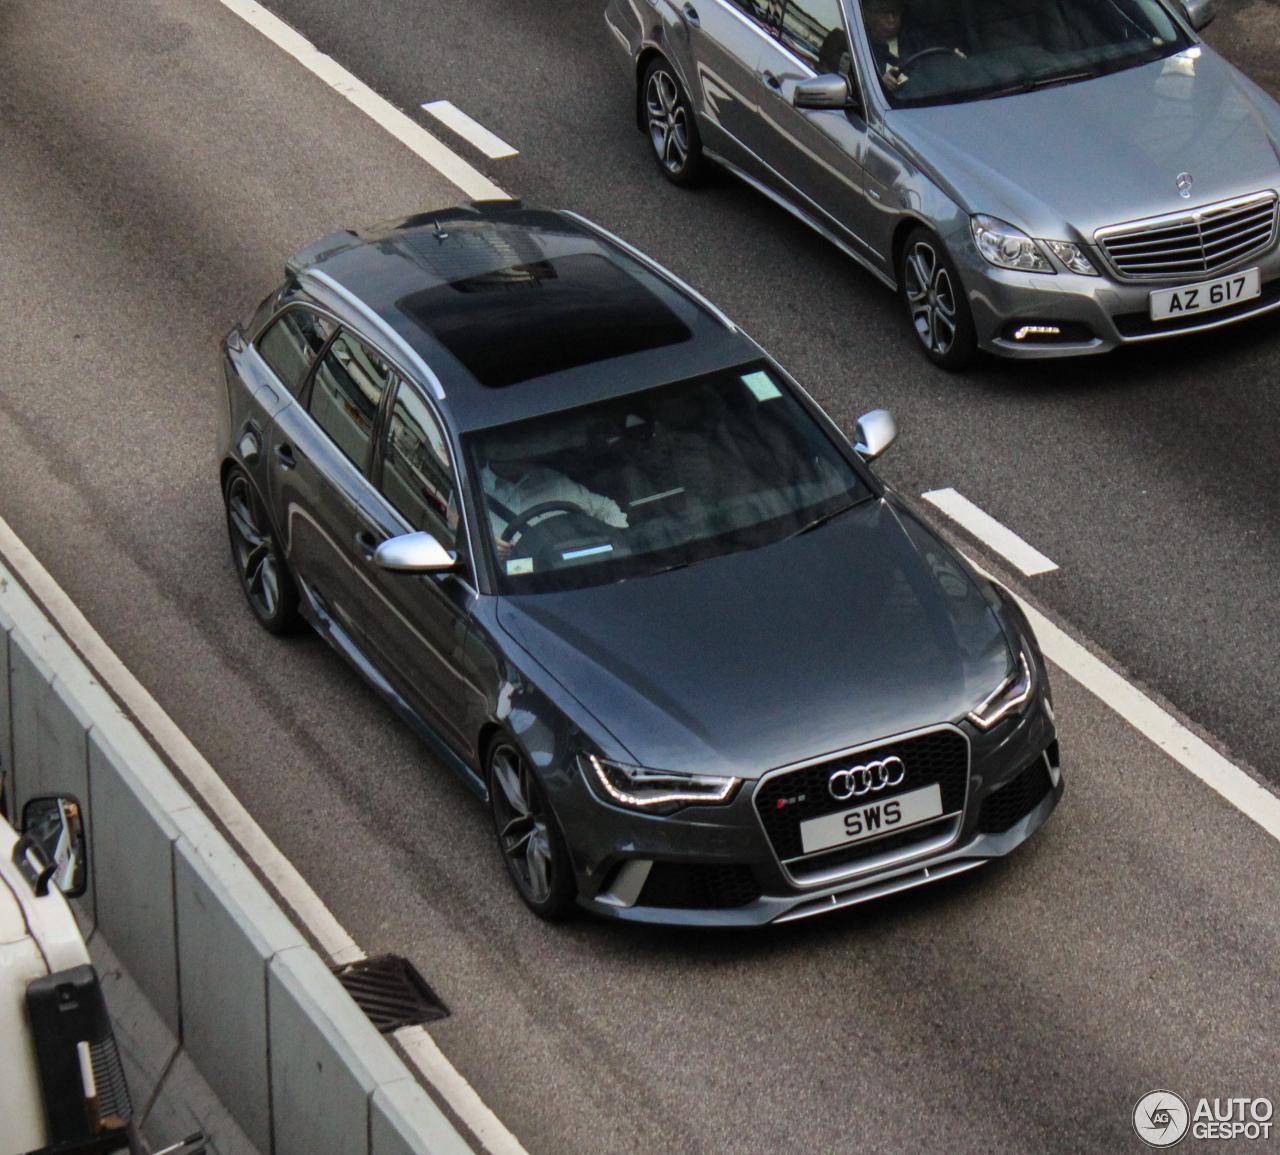 2017 Audi Rs 7 Camshaft: Audi RS6 Avant C7